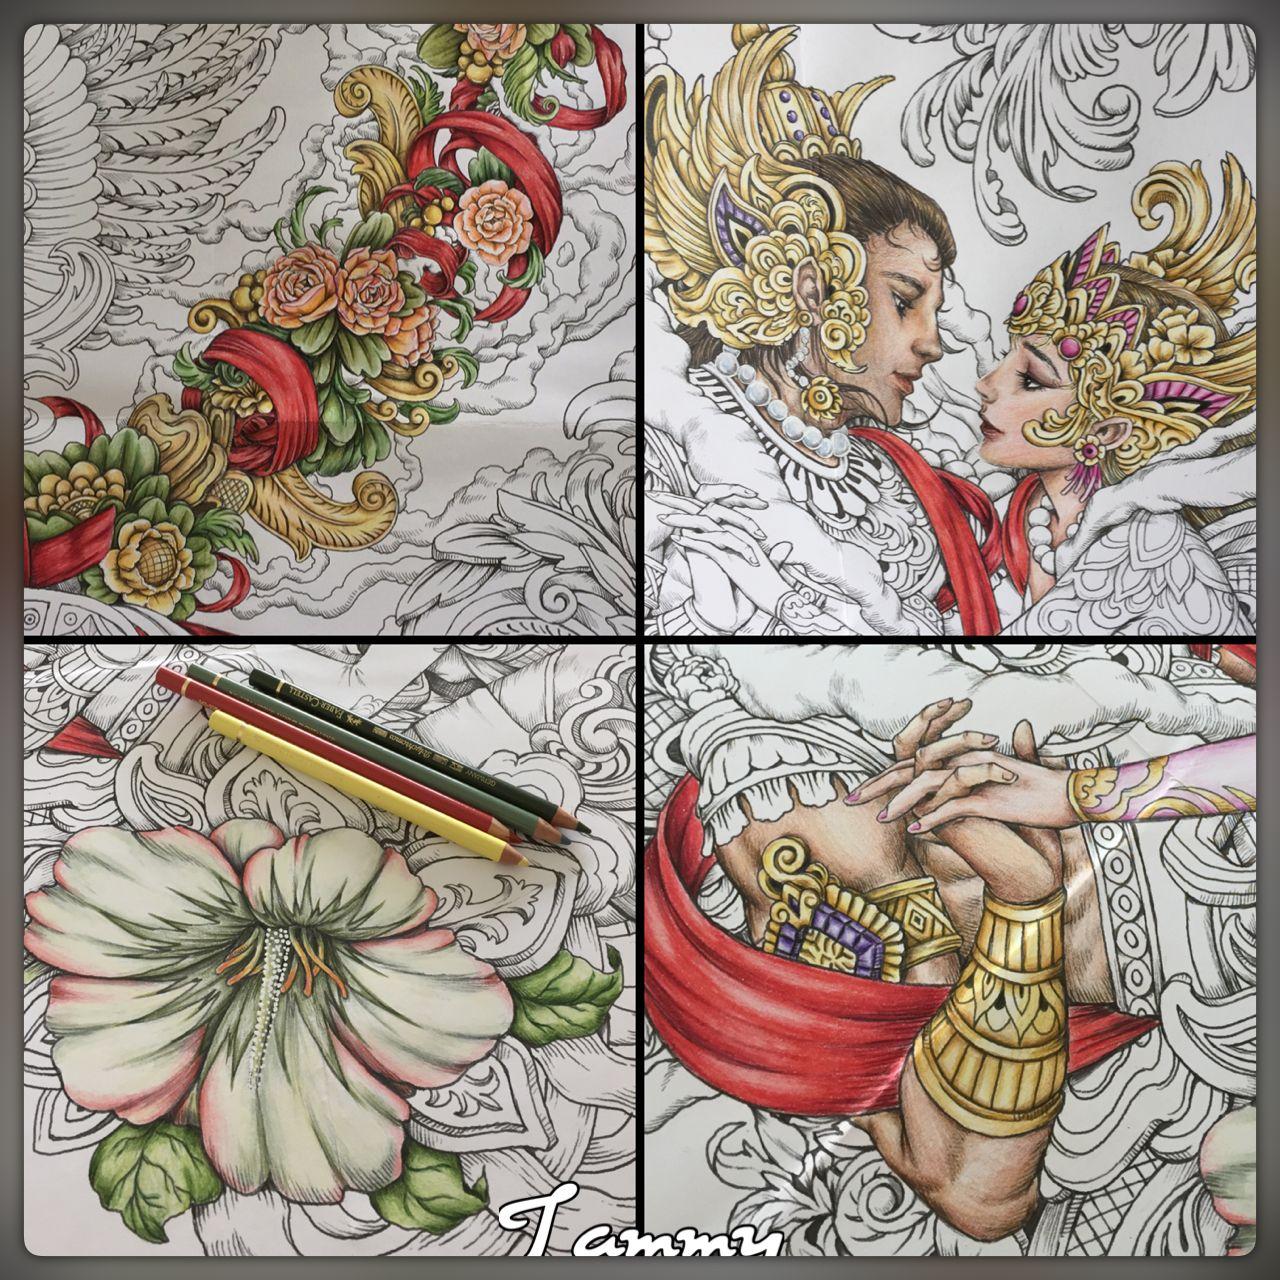 Heavenly Lovedetails Poster Lets Color Love Nicholas Chandrawienata